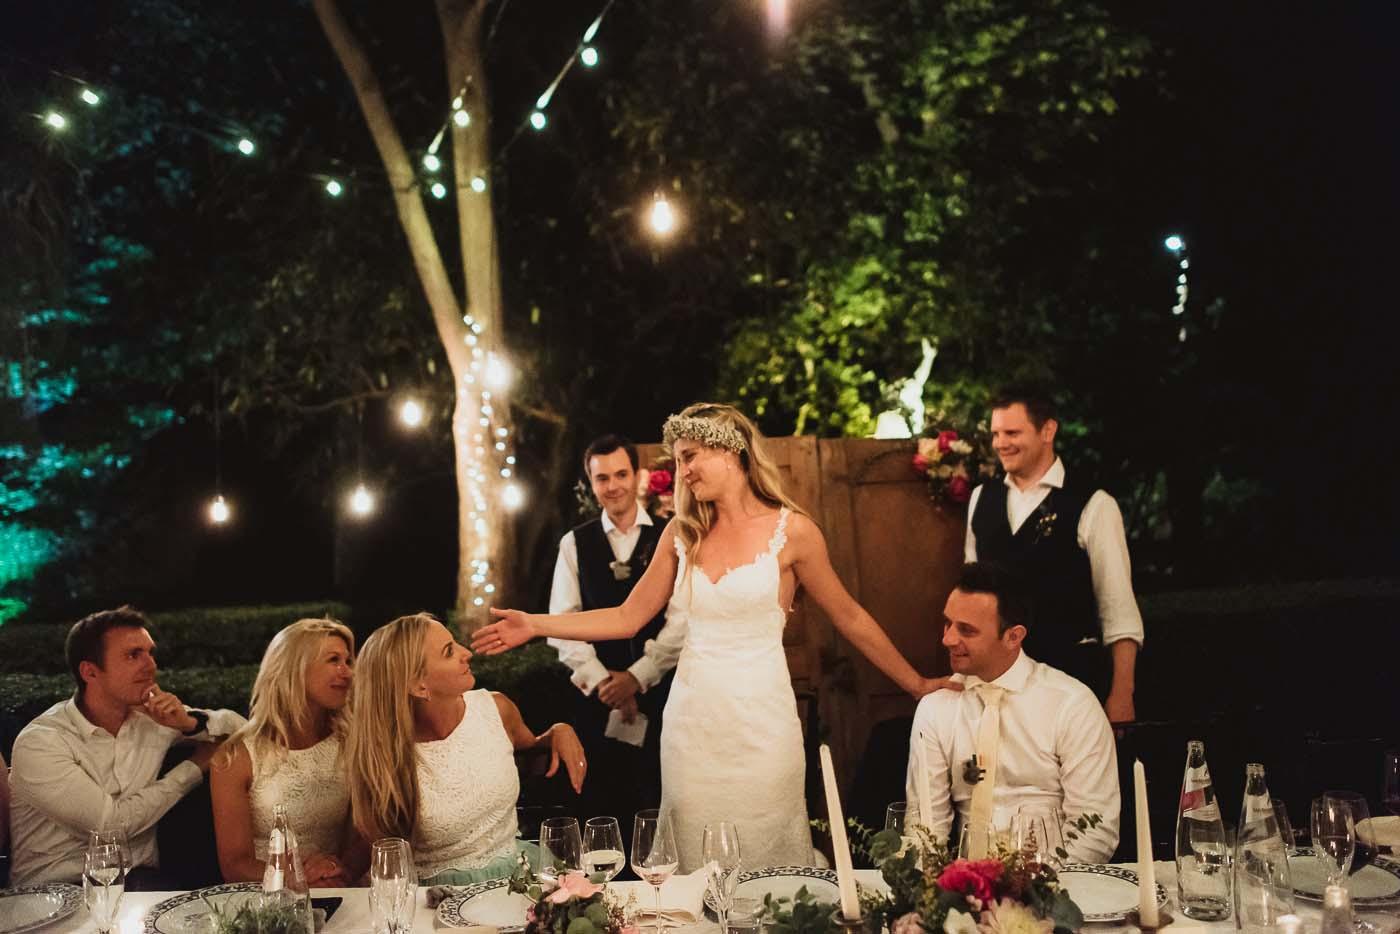 Relaxed-wedding-borgo-stomennano-1209